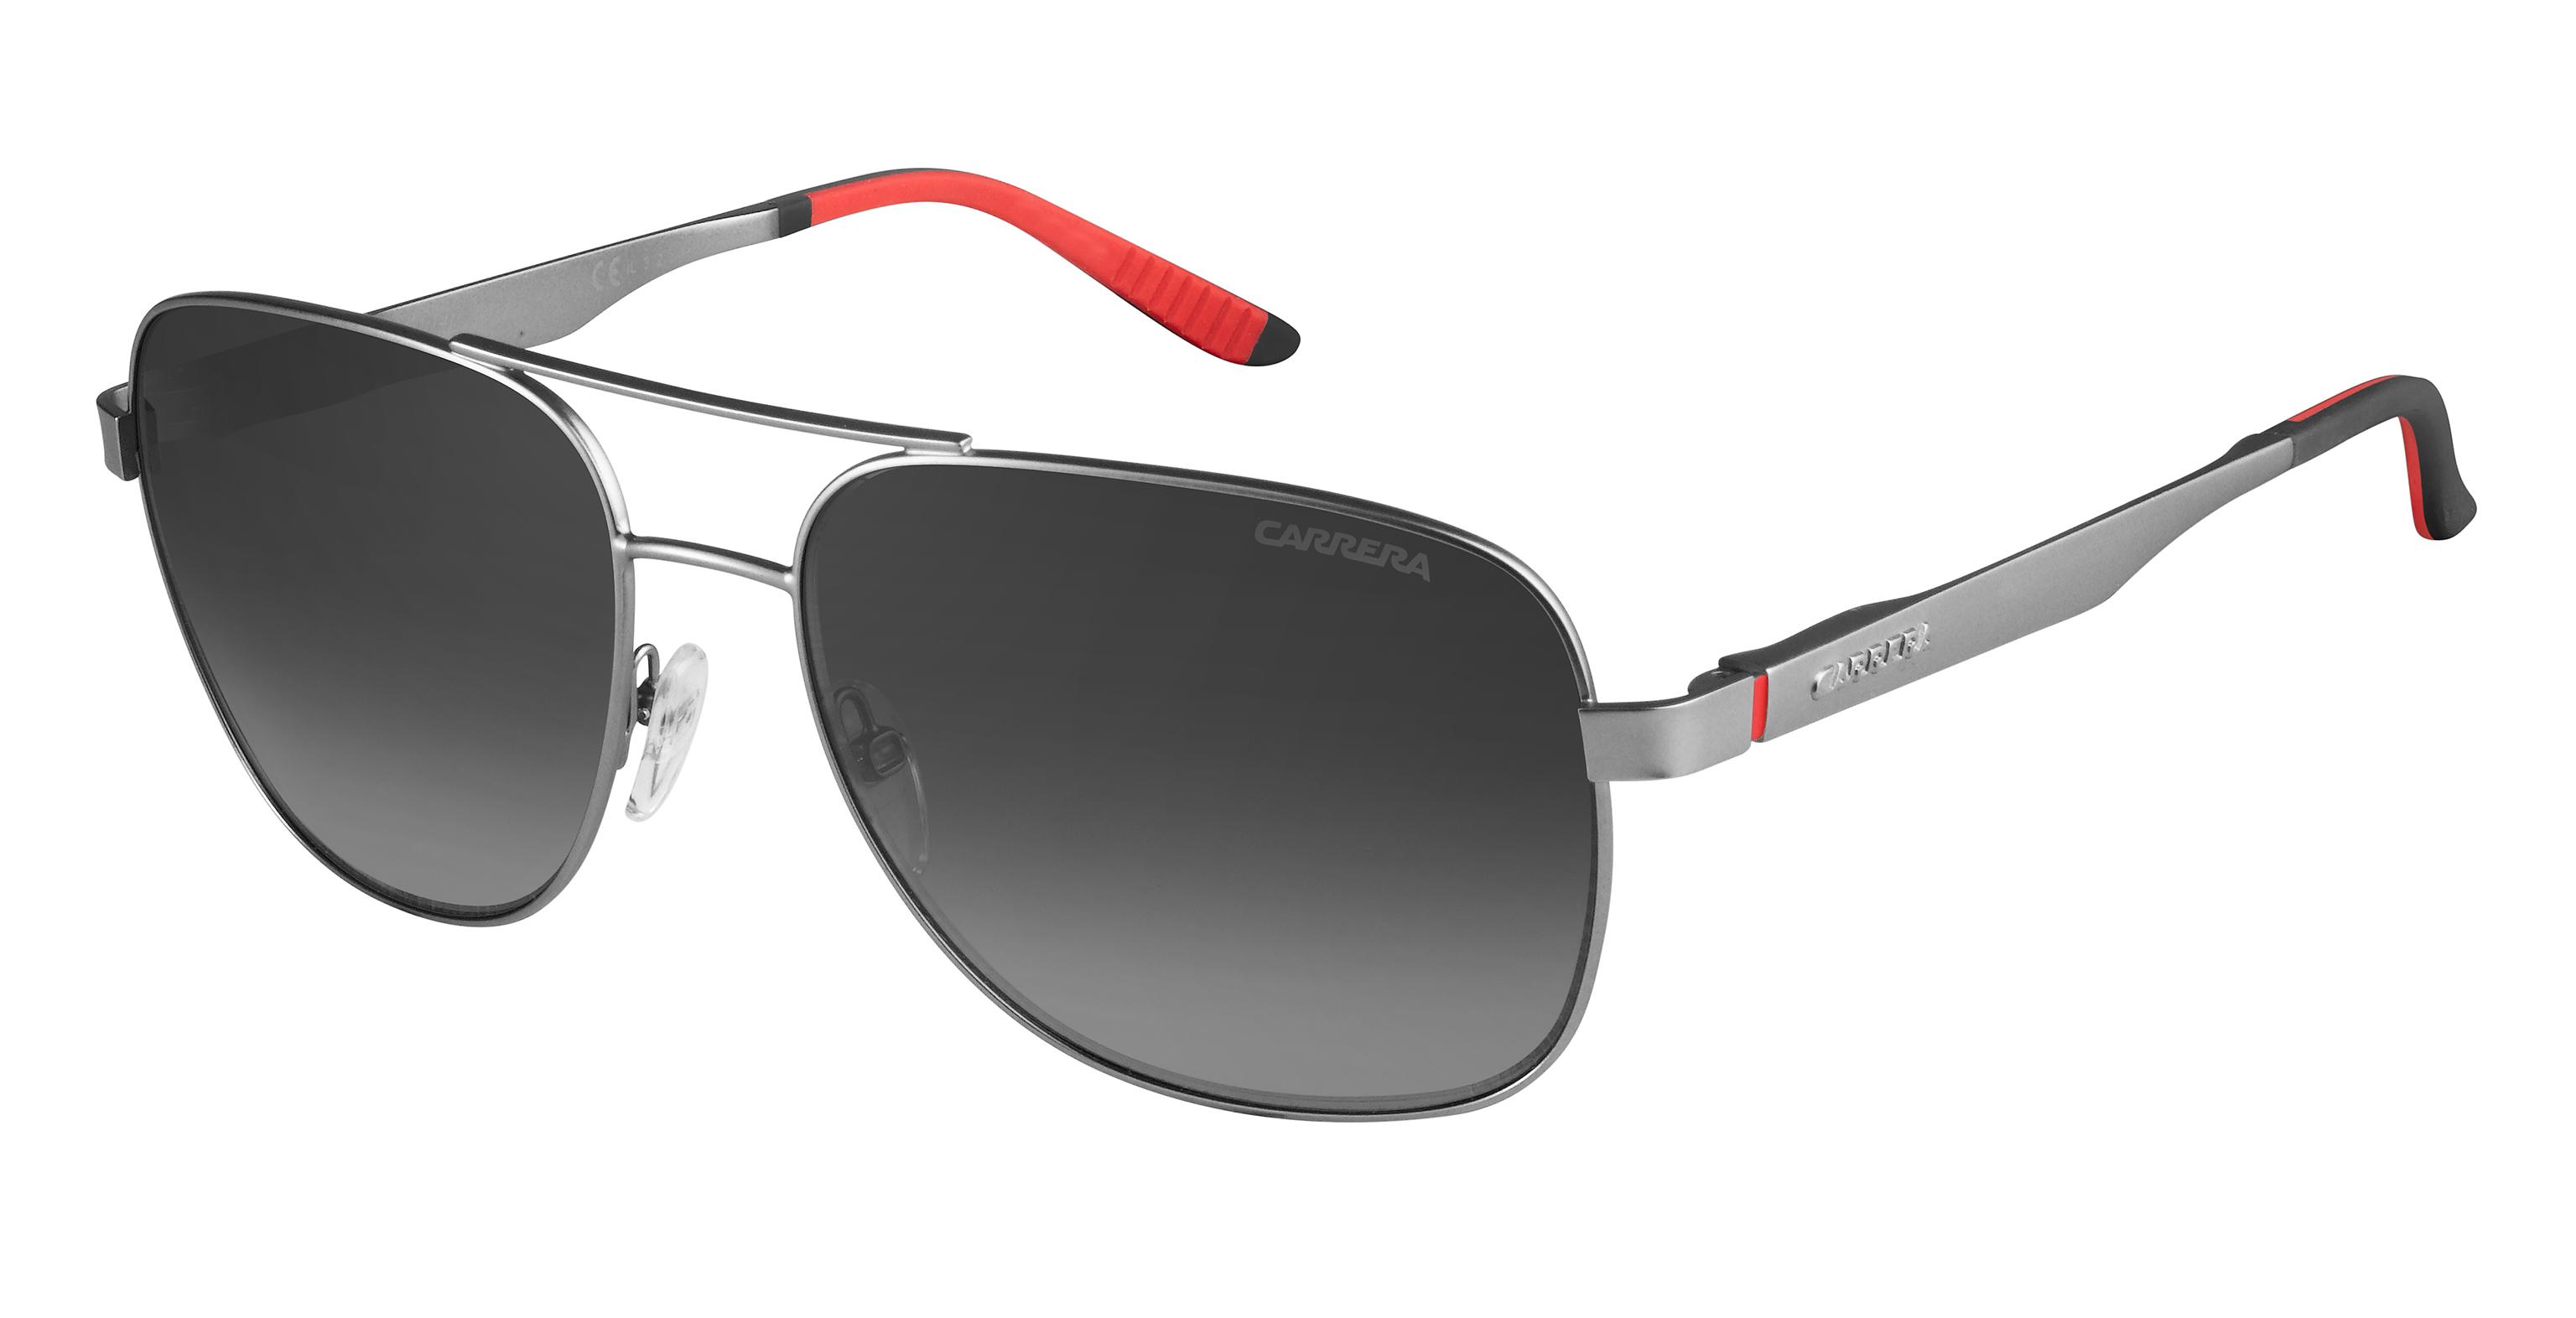 Carrera Men's Polarized Sunglasses (Grey)  $44 + Free Shipping